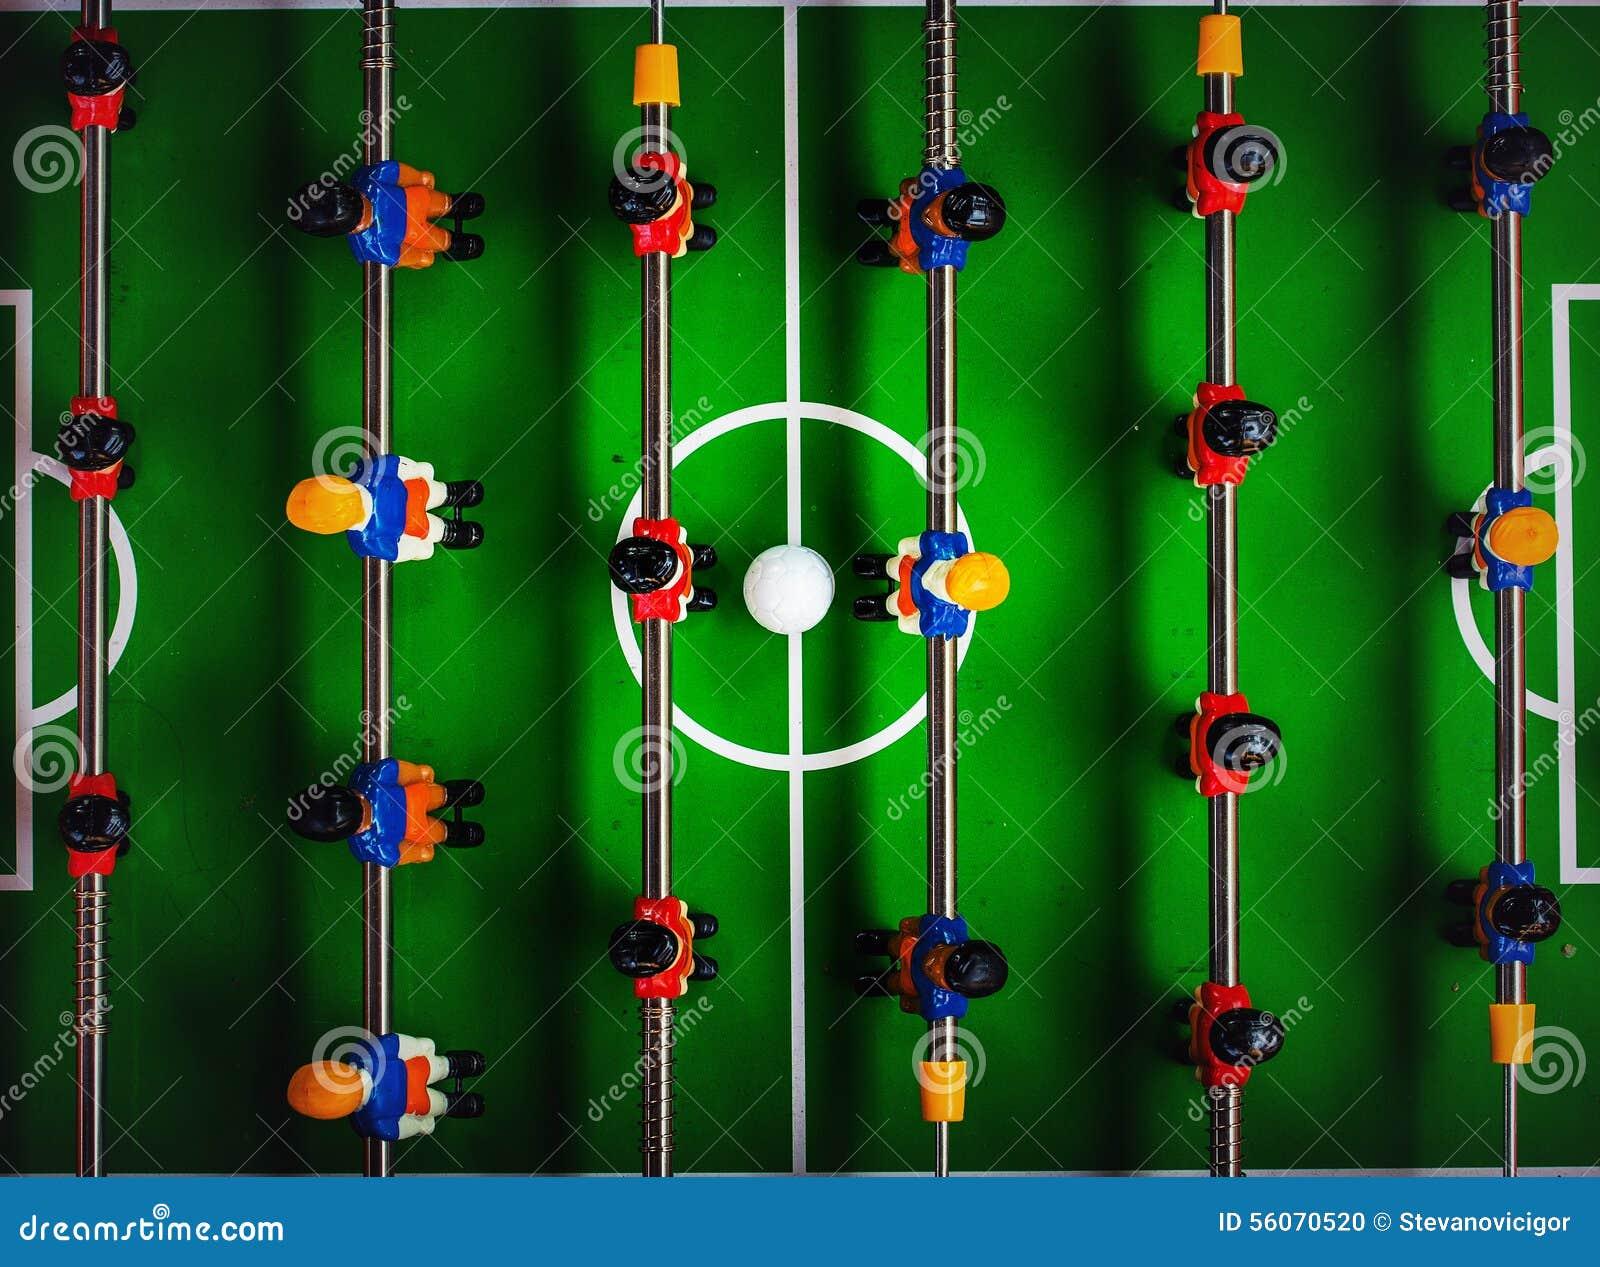 Kicker Games